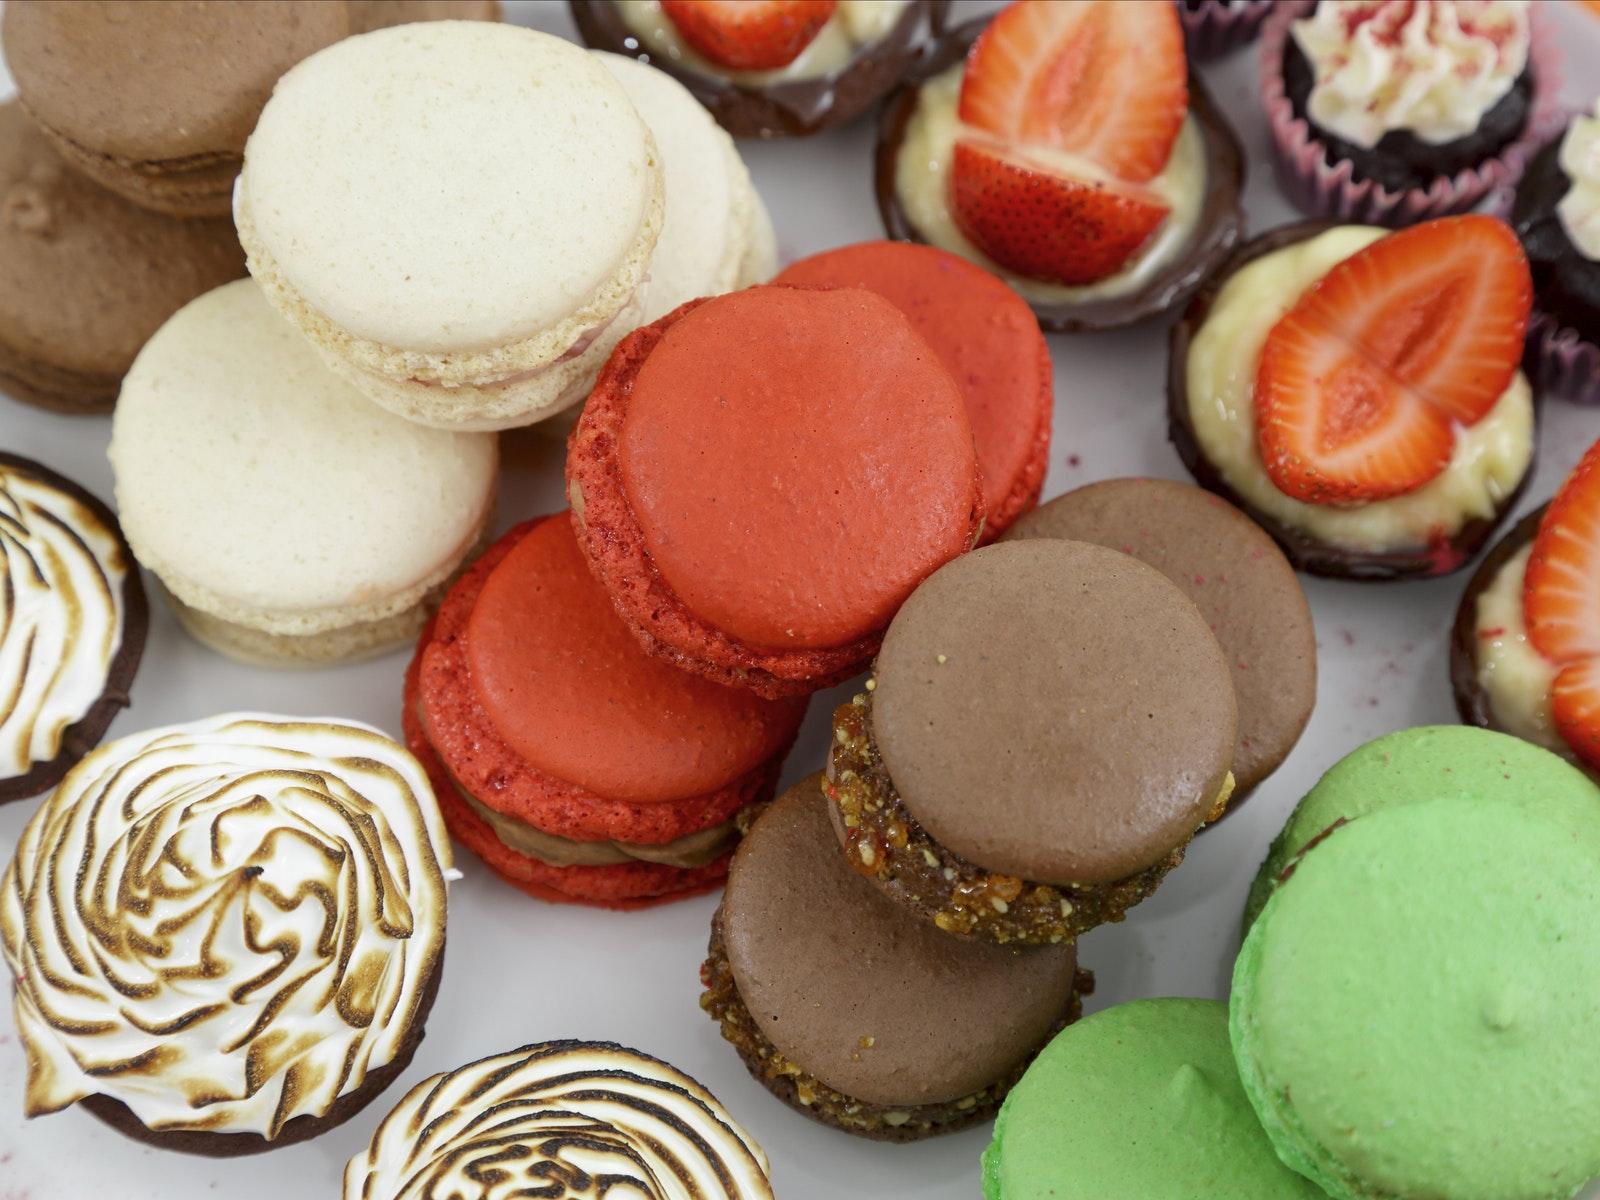 Jacican - Pastry - Macarons